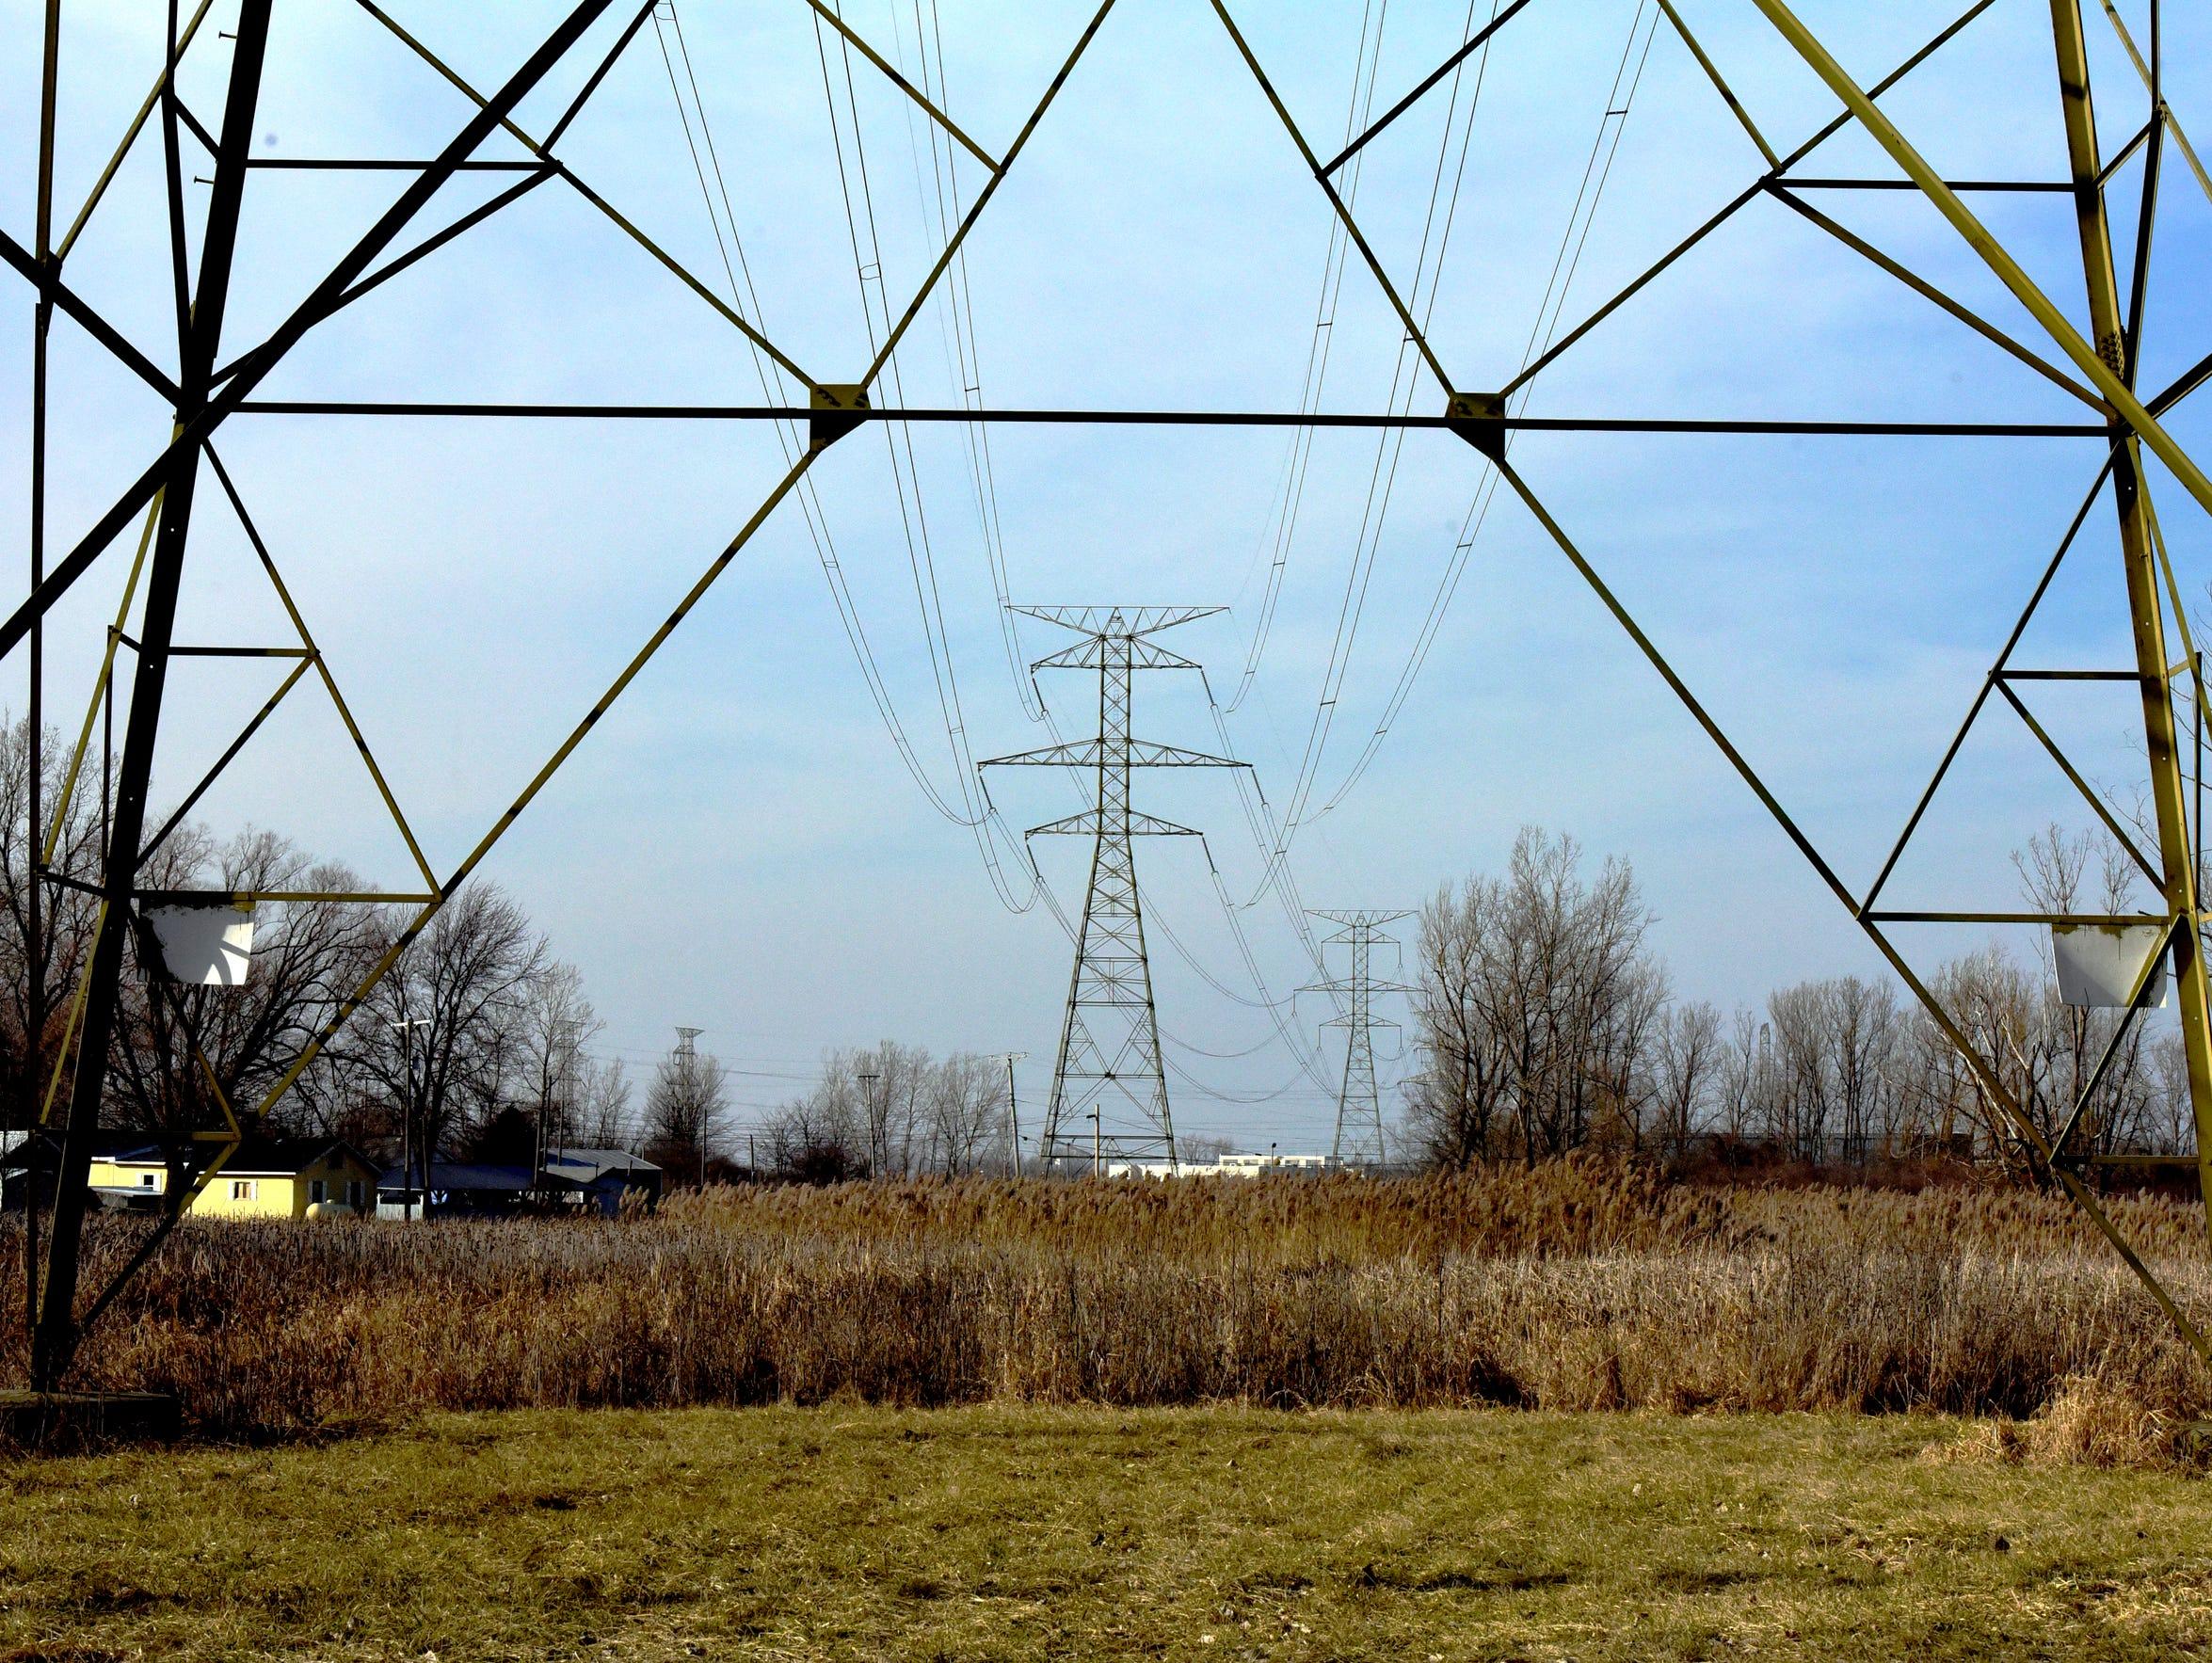 FirstEnergy CEO Chuck Jones praised U.S. Energy Secretary